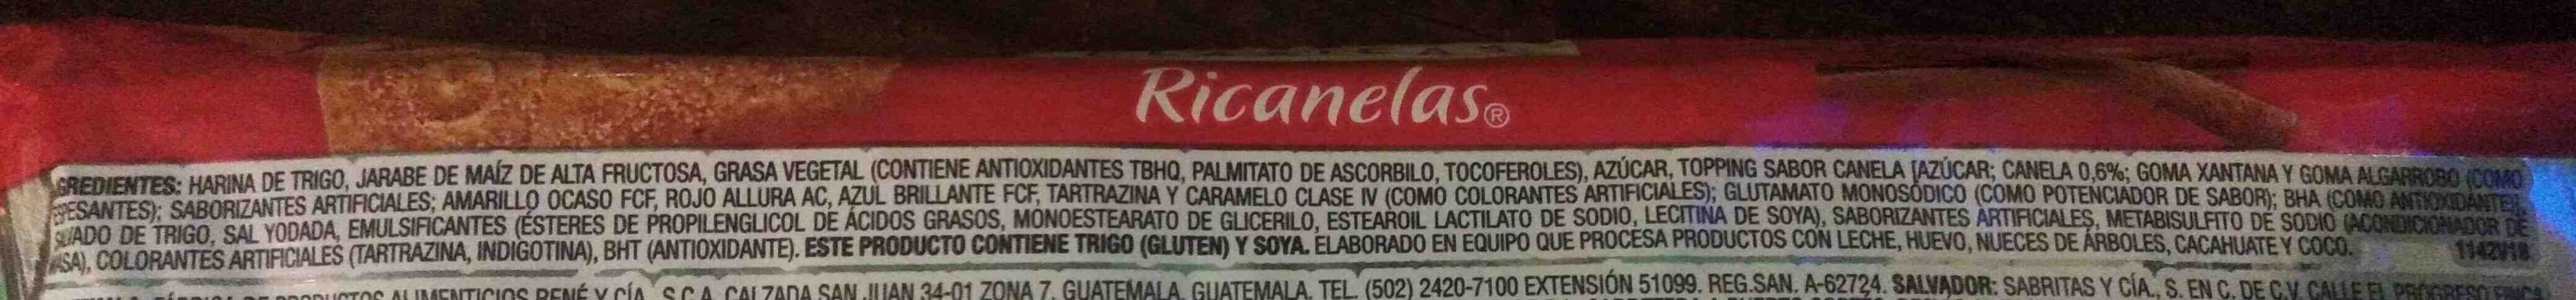 Ricanelas - Ingredients - es